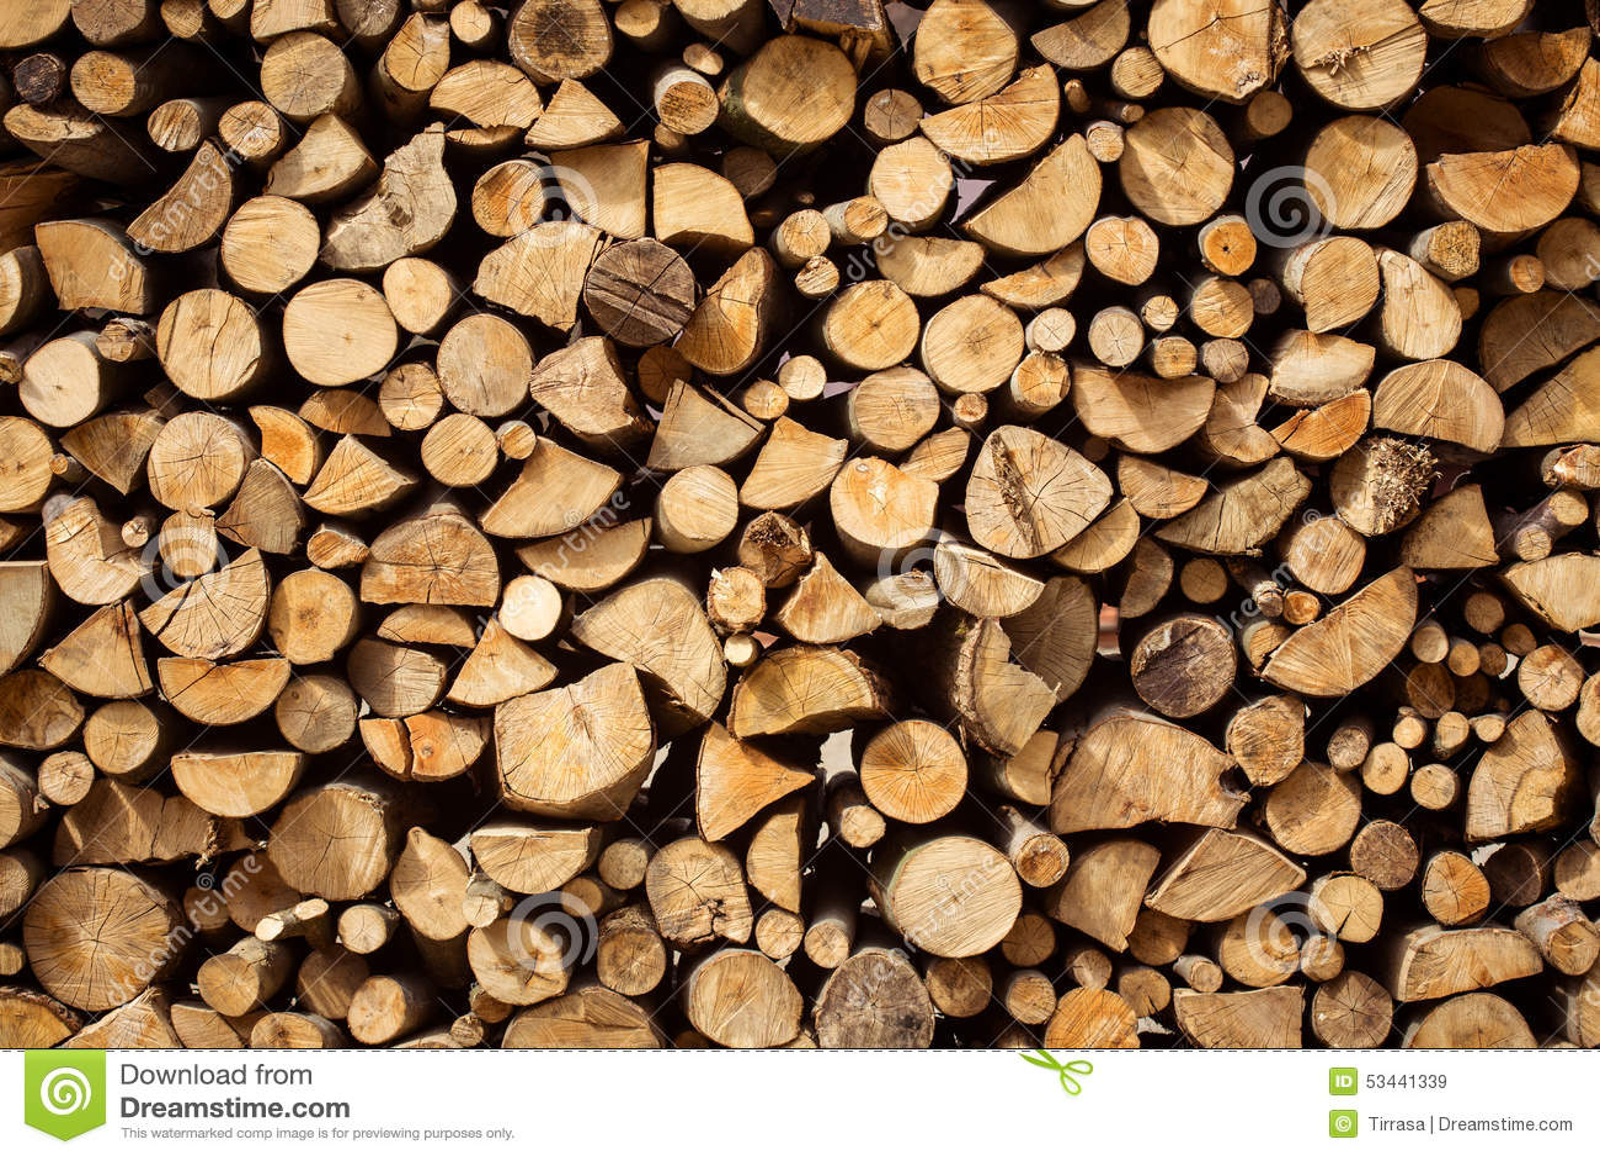 Firewood Stock Photo Image 53441339